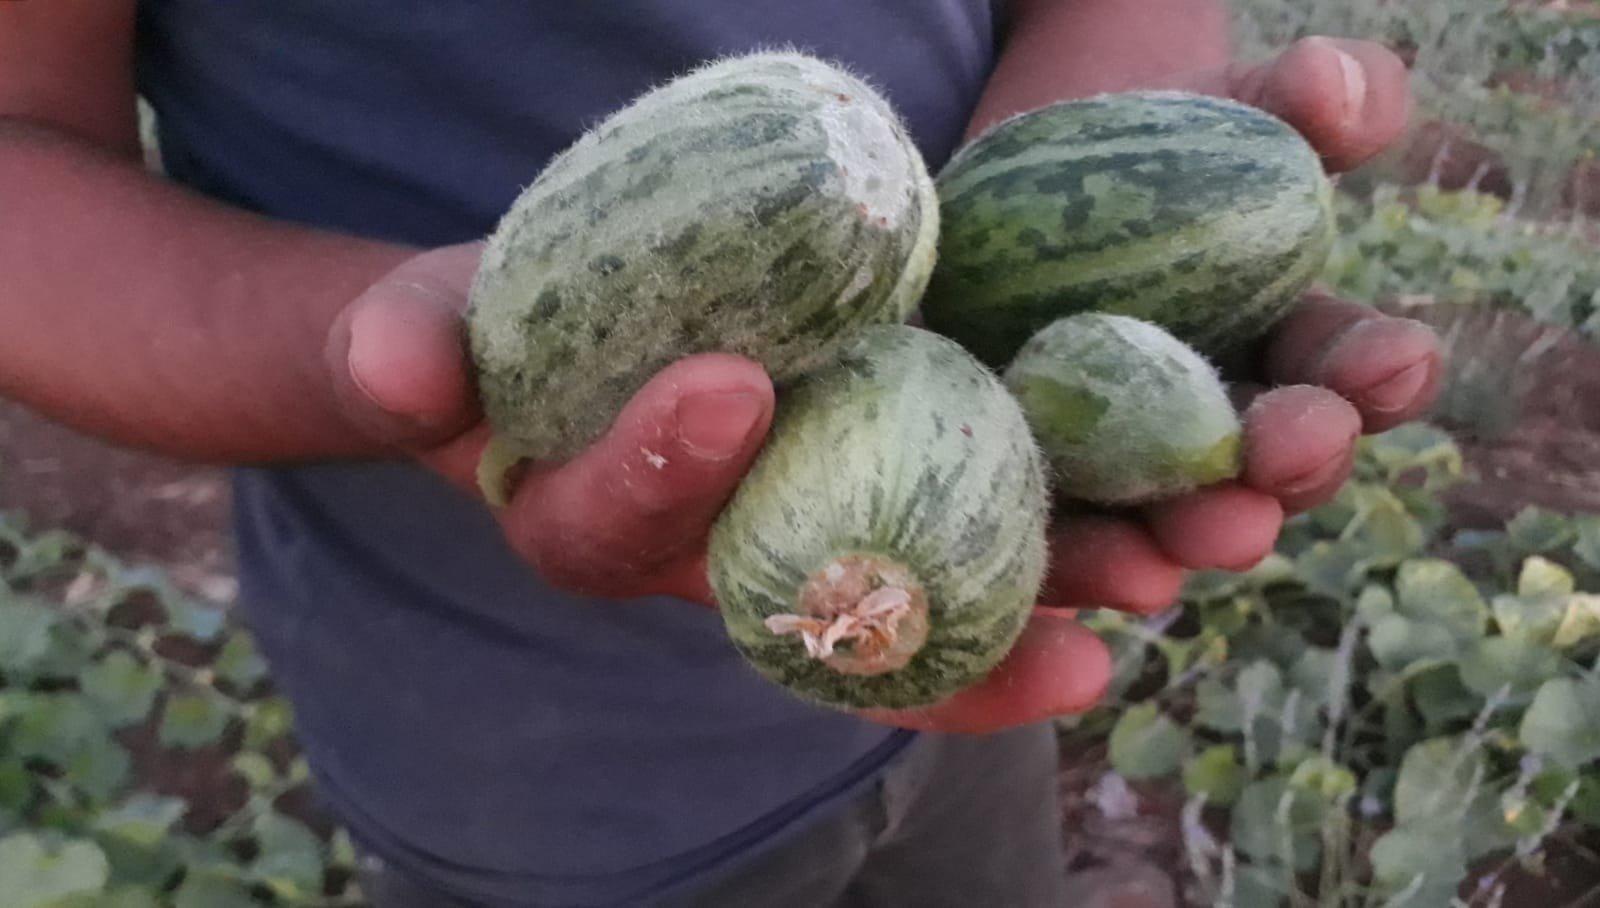 A man holds the fruit of the şelengo plant, a member of the gourd family, in Şanlıurfa, Turkey, June 14, 2021. (IHA Photo)